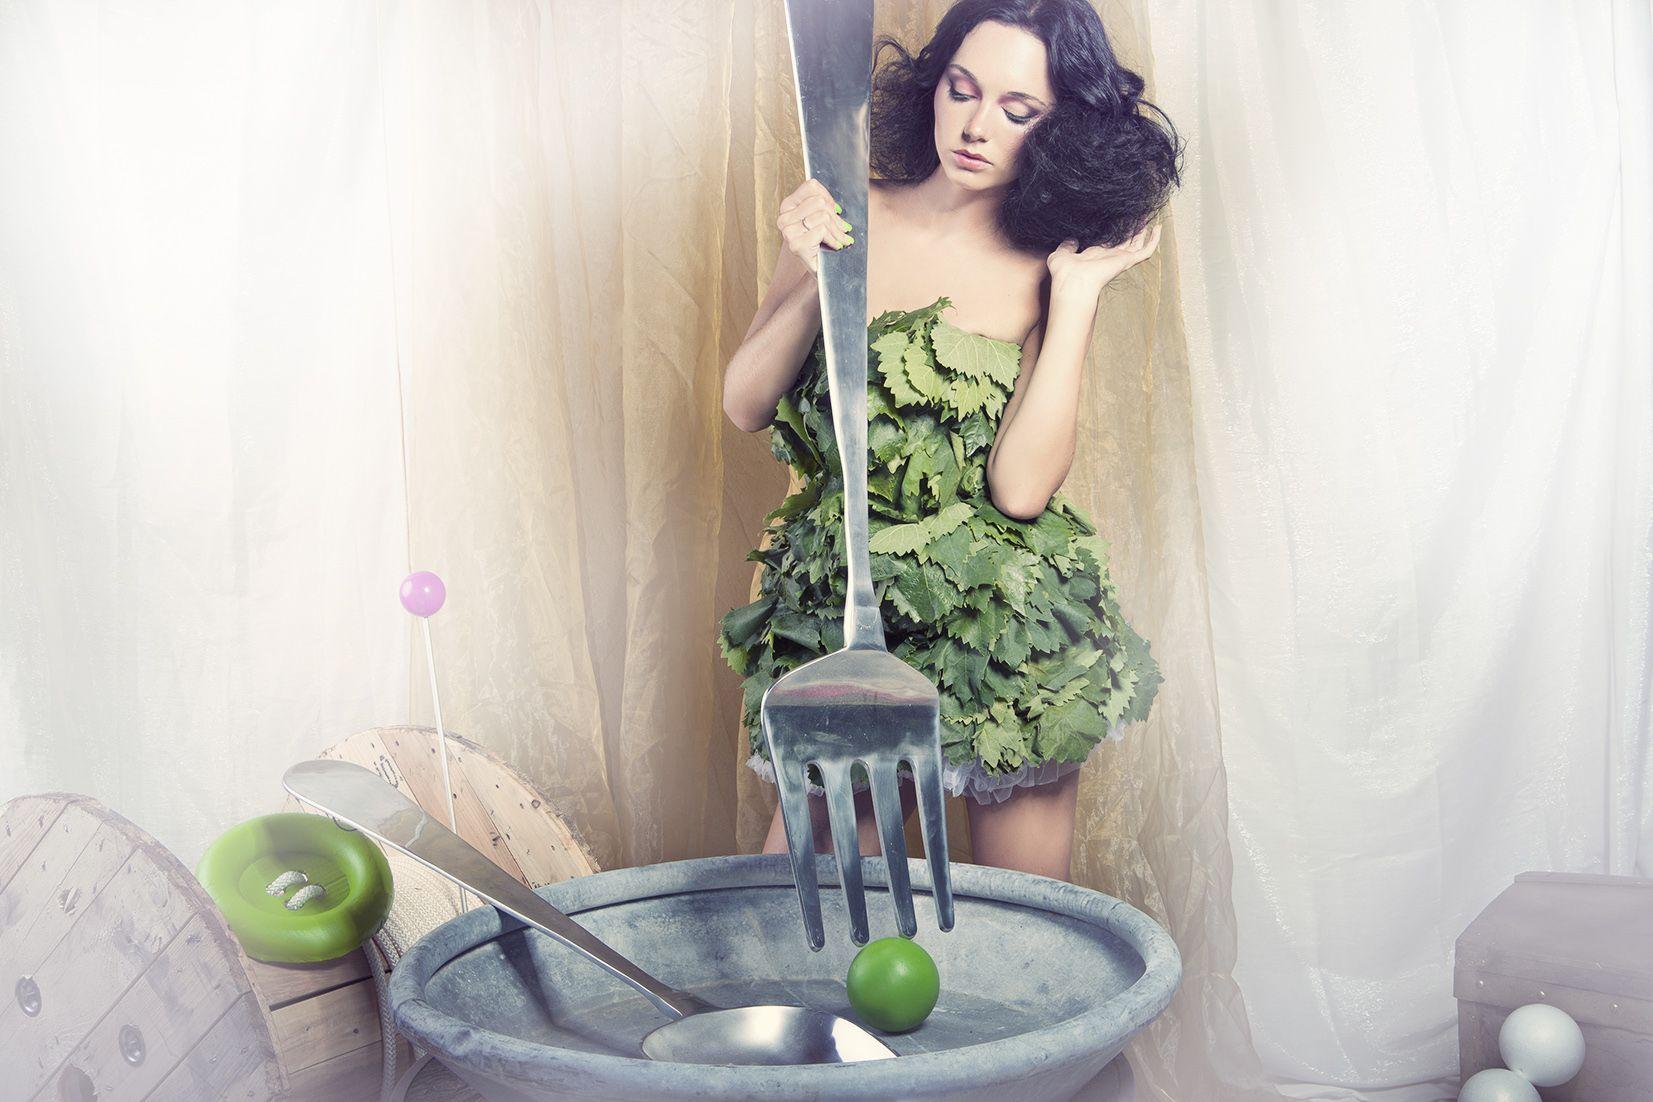 Poucette by Mathilde Oscar